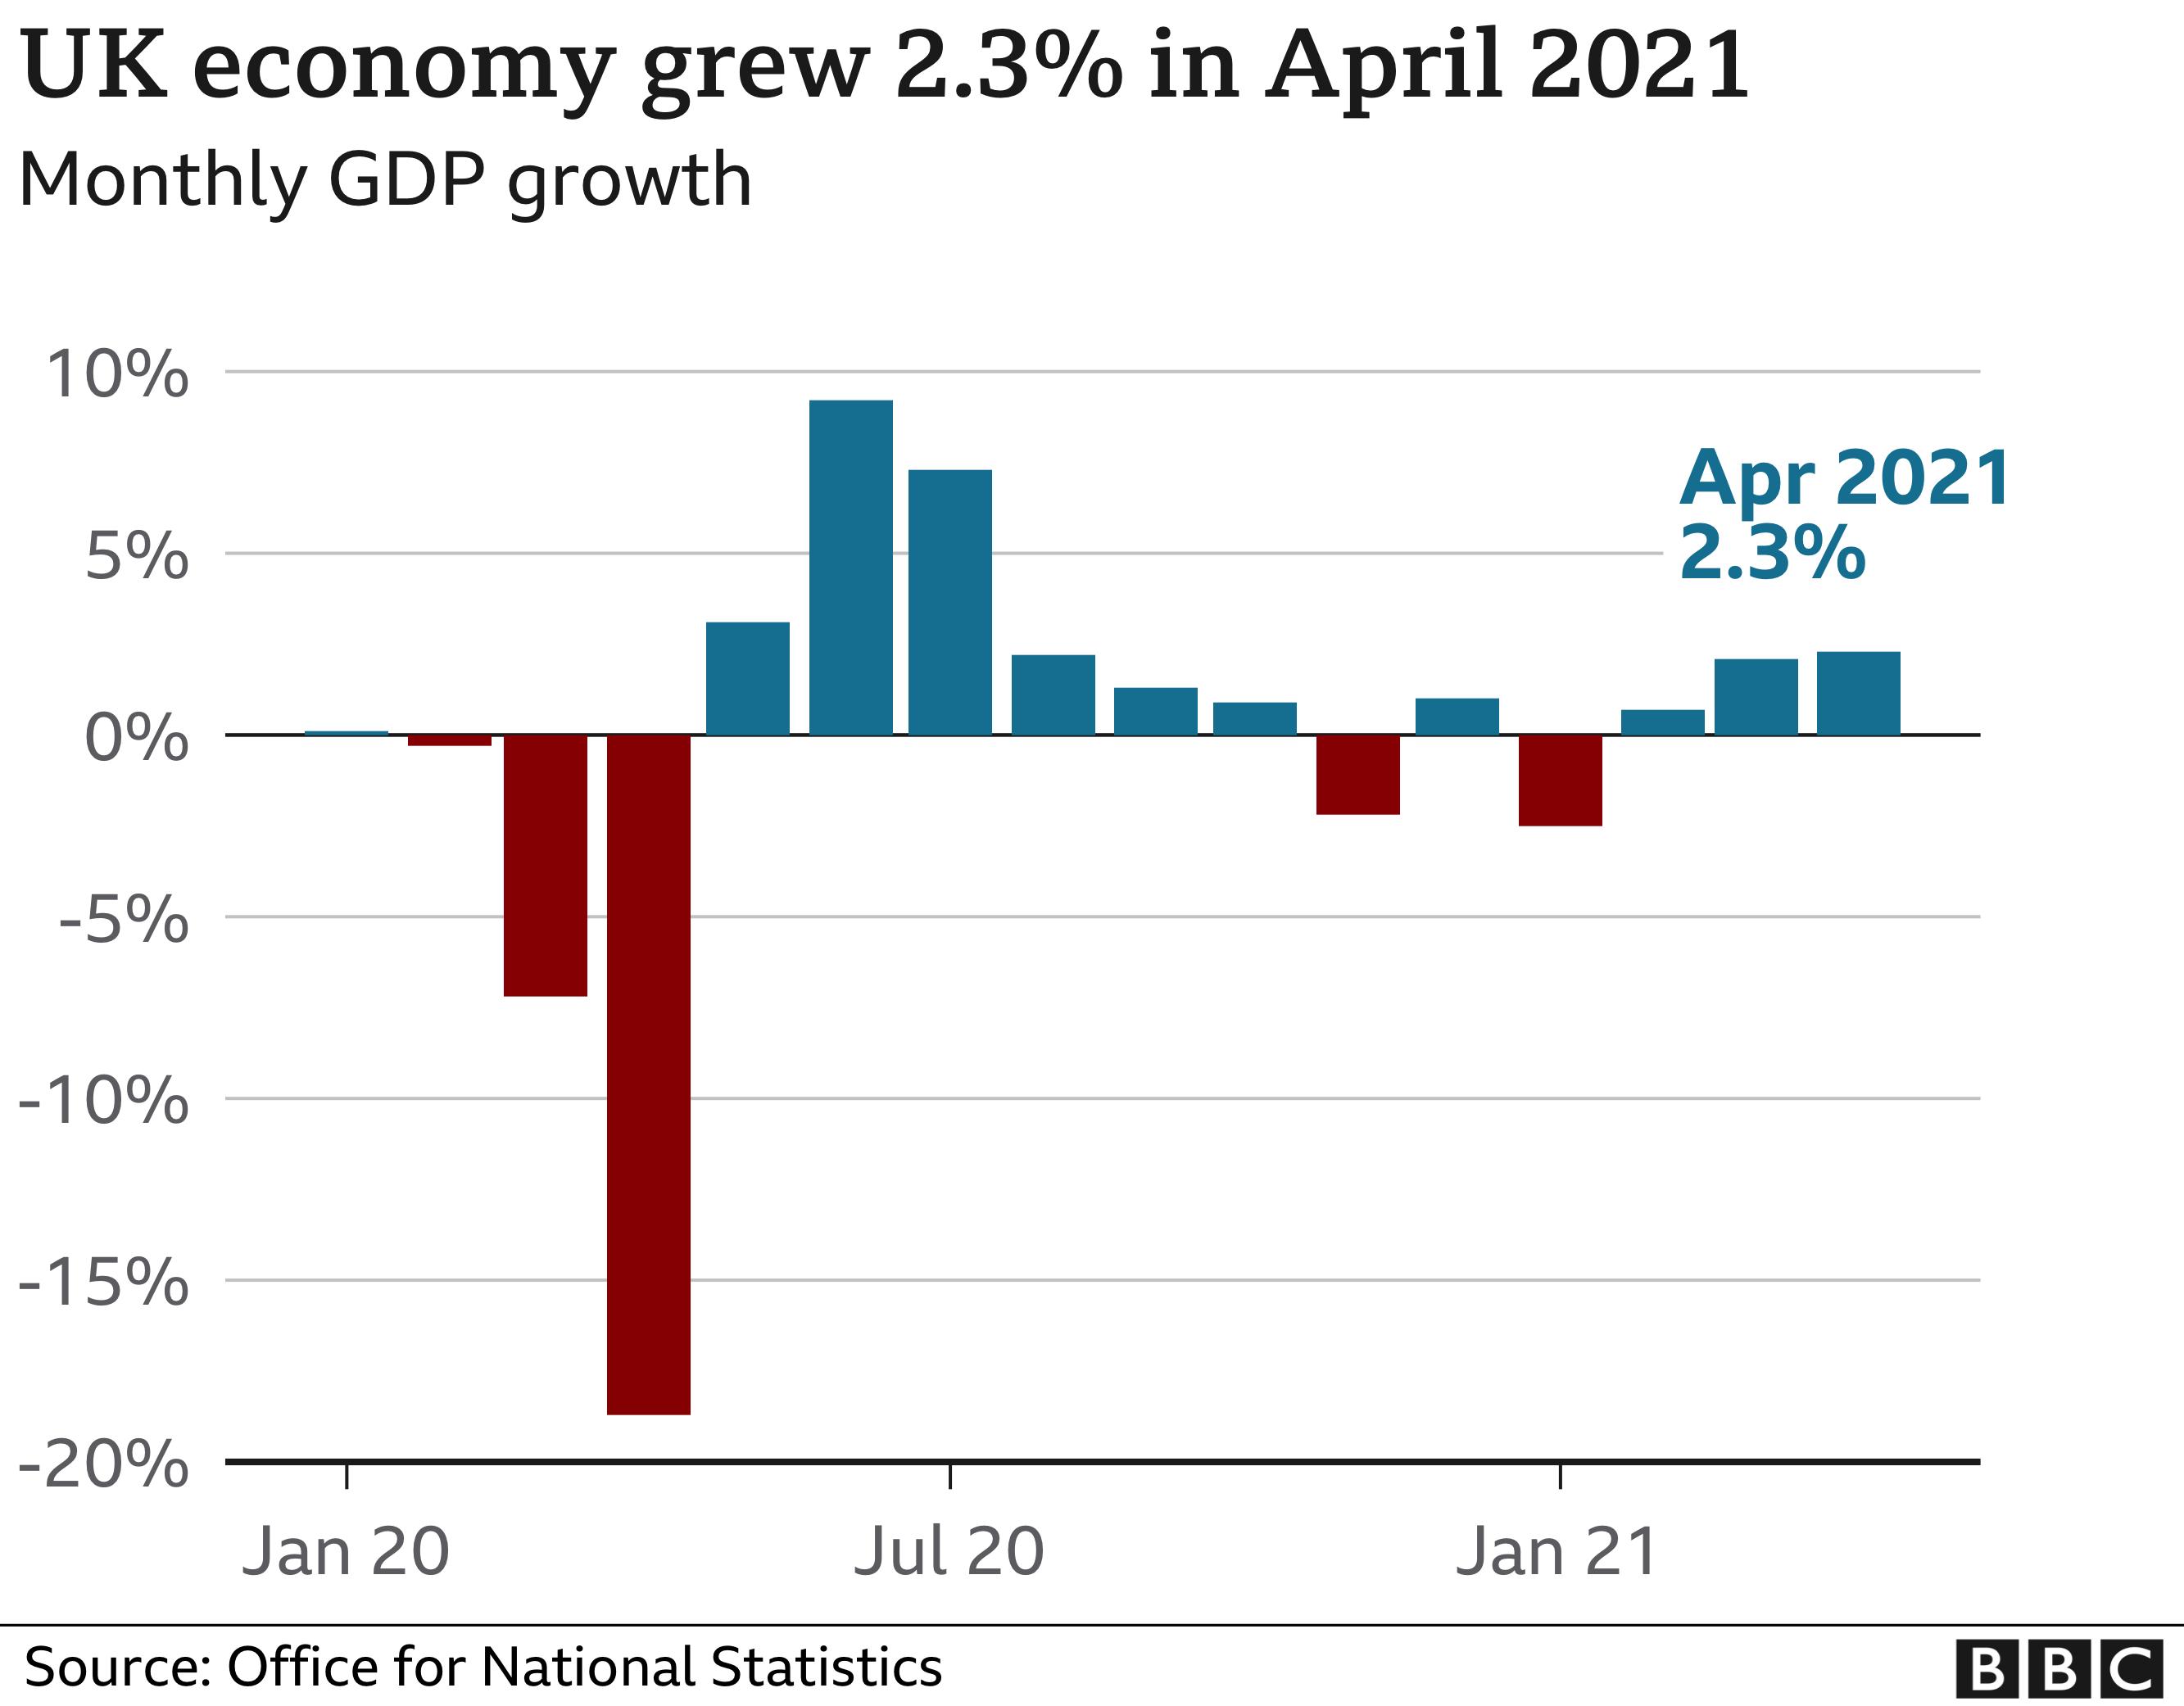 April GDP growth